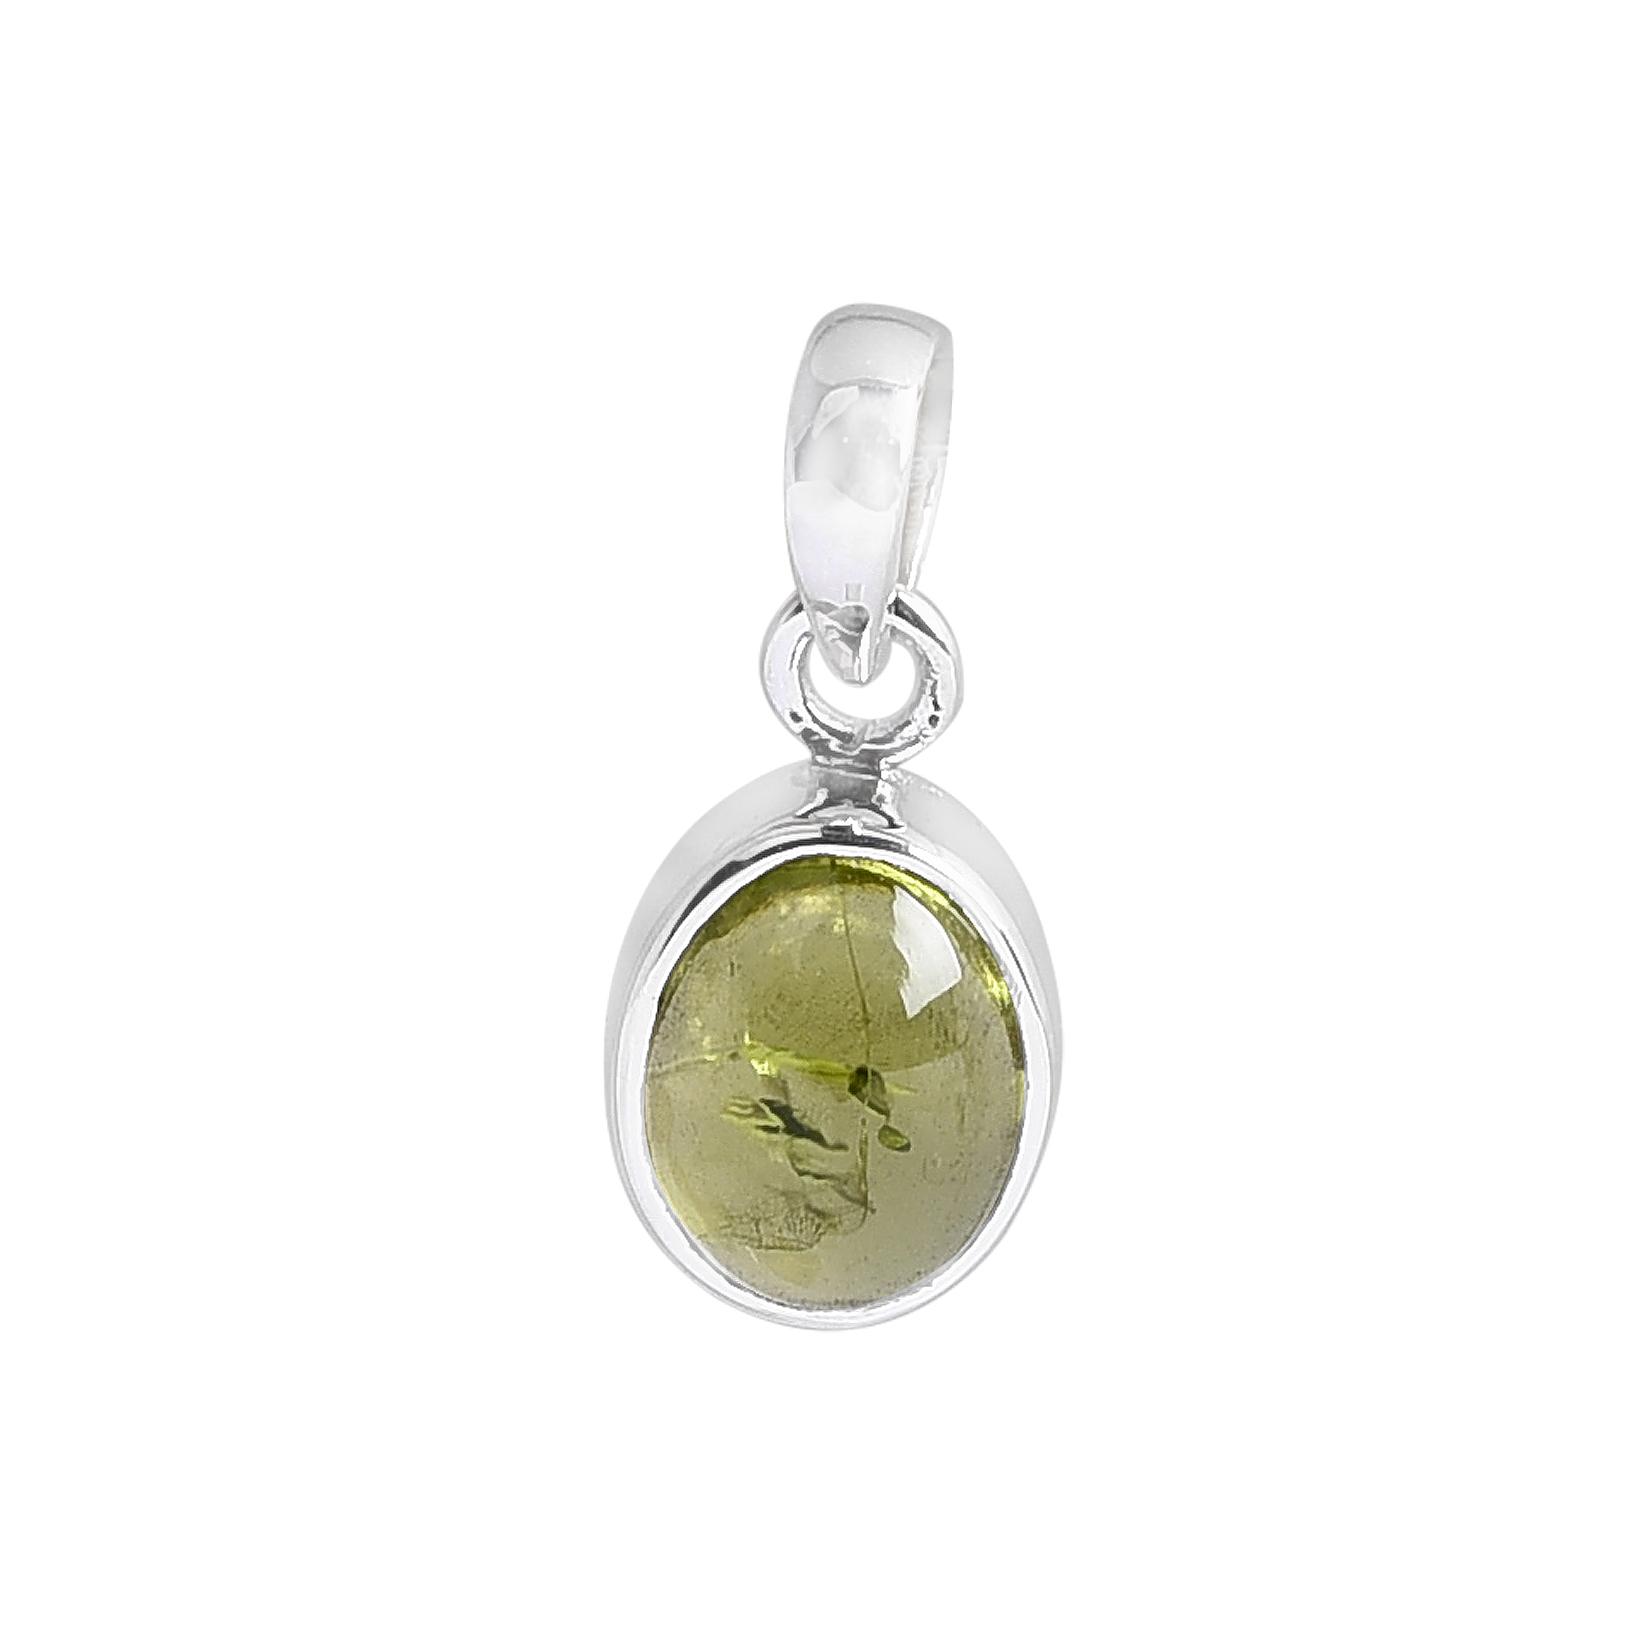 Necklace Jewellery Designer Pendant Silver Plated Silver Plated Pendant Handmade Jewelry Peridot Pendant Gemstone Pendant